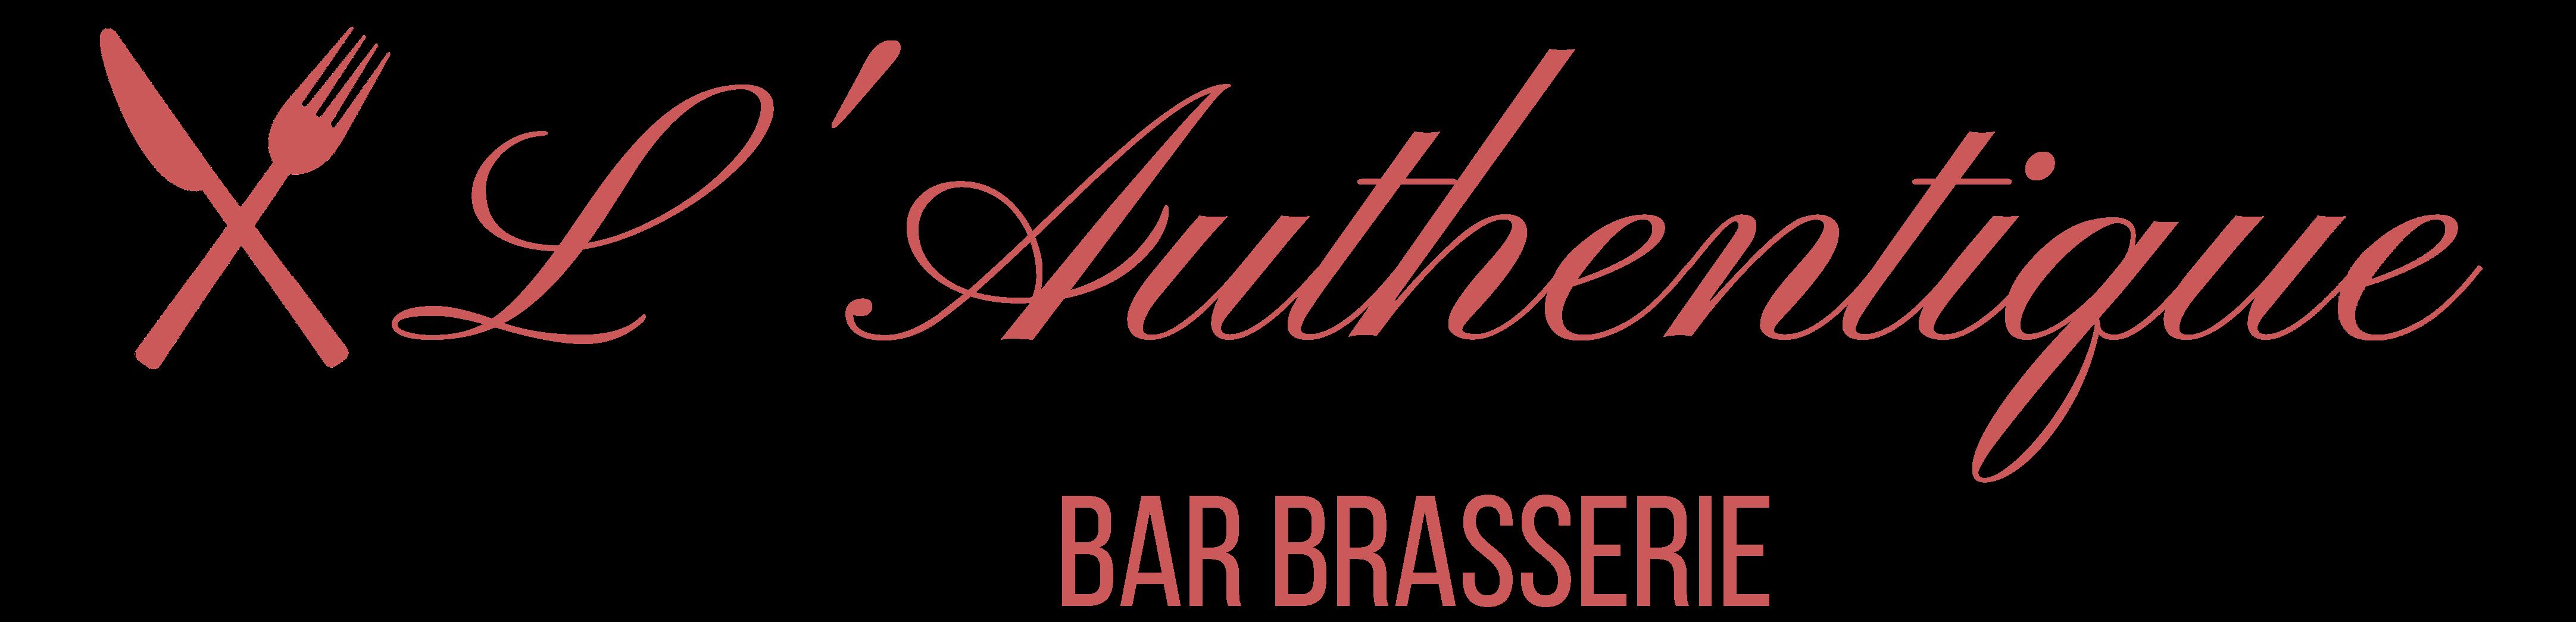 Bar Brasserie L'Authentique